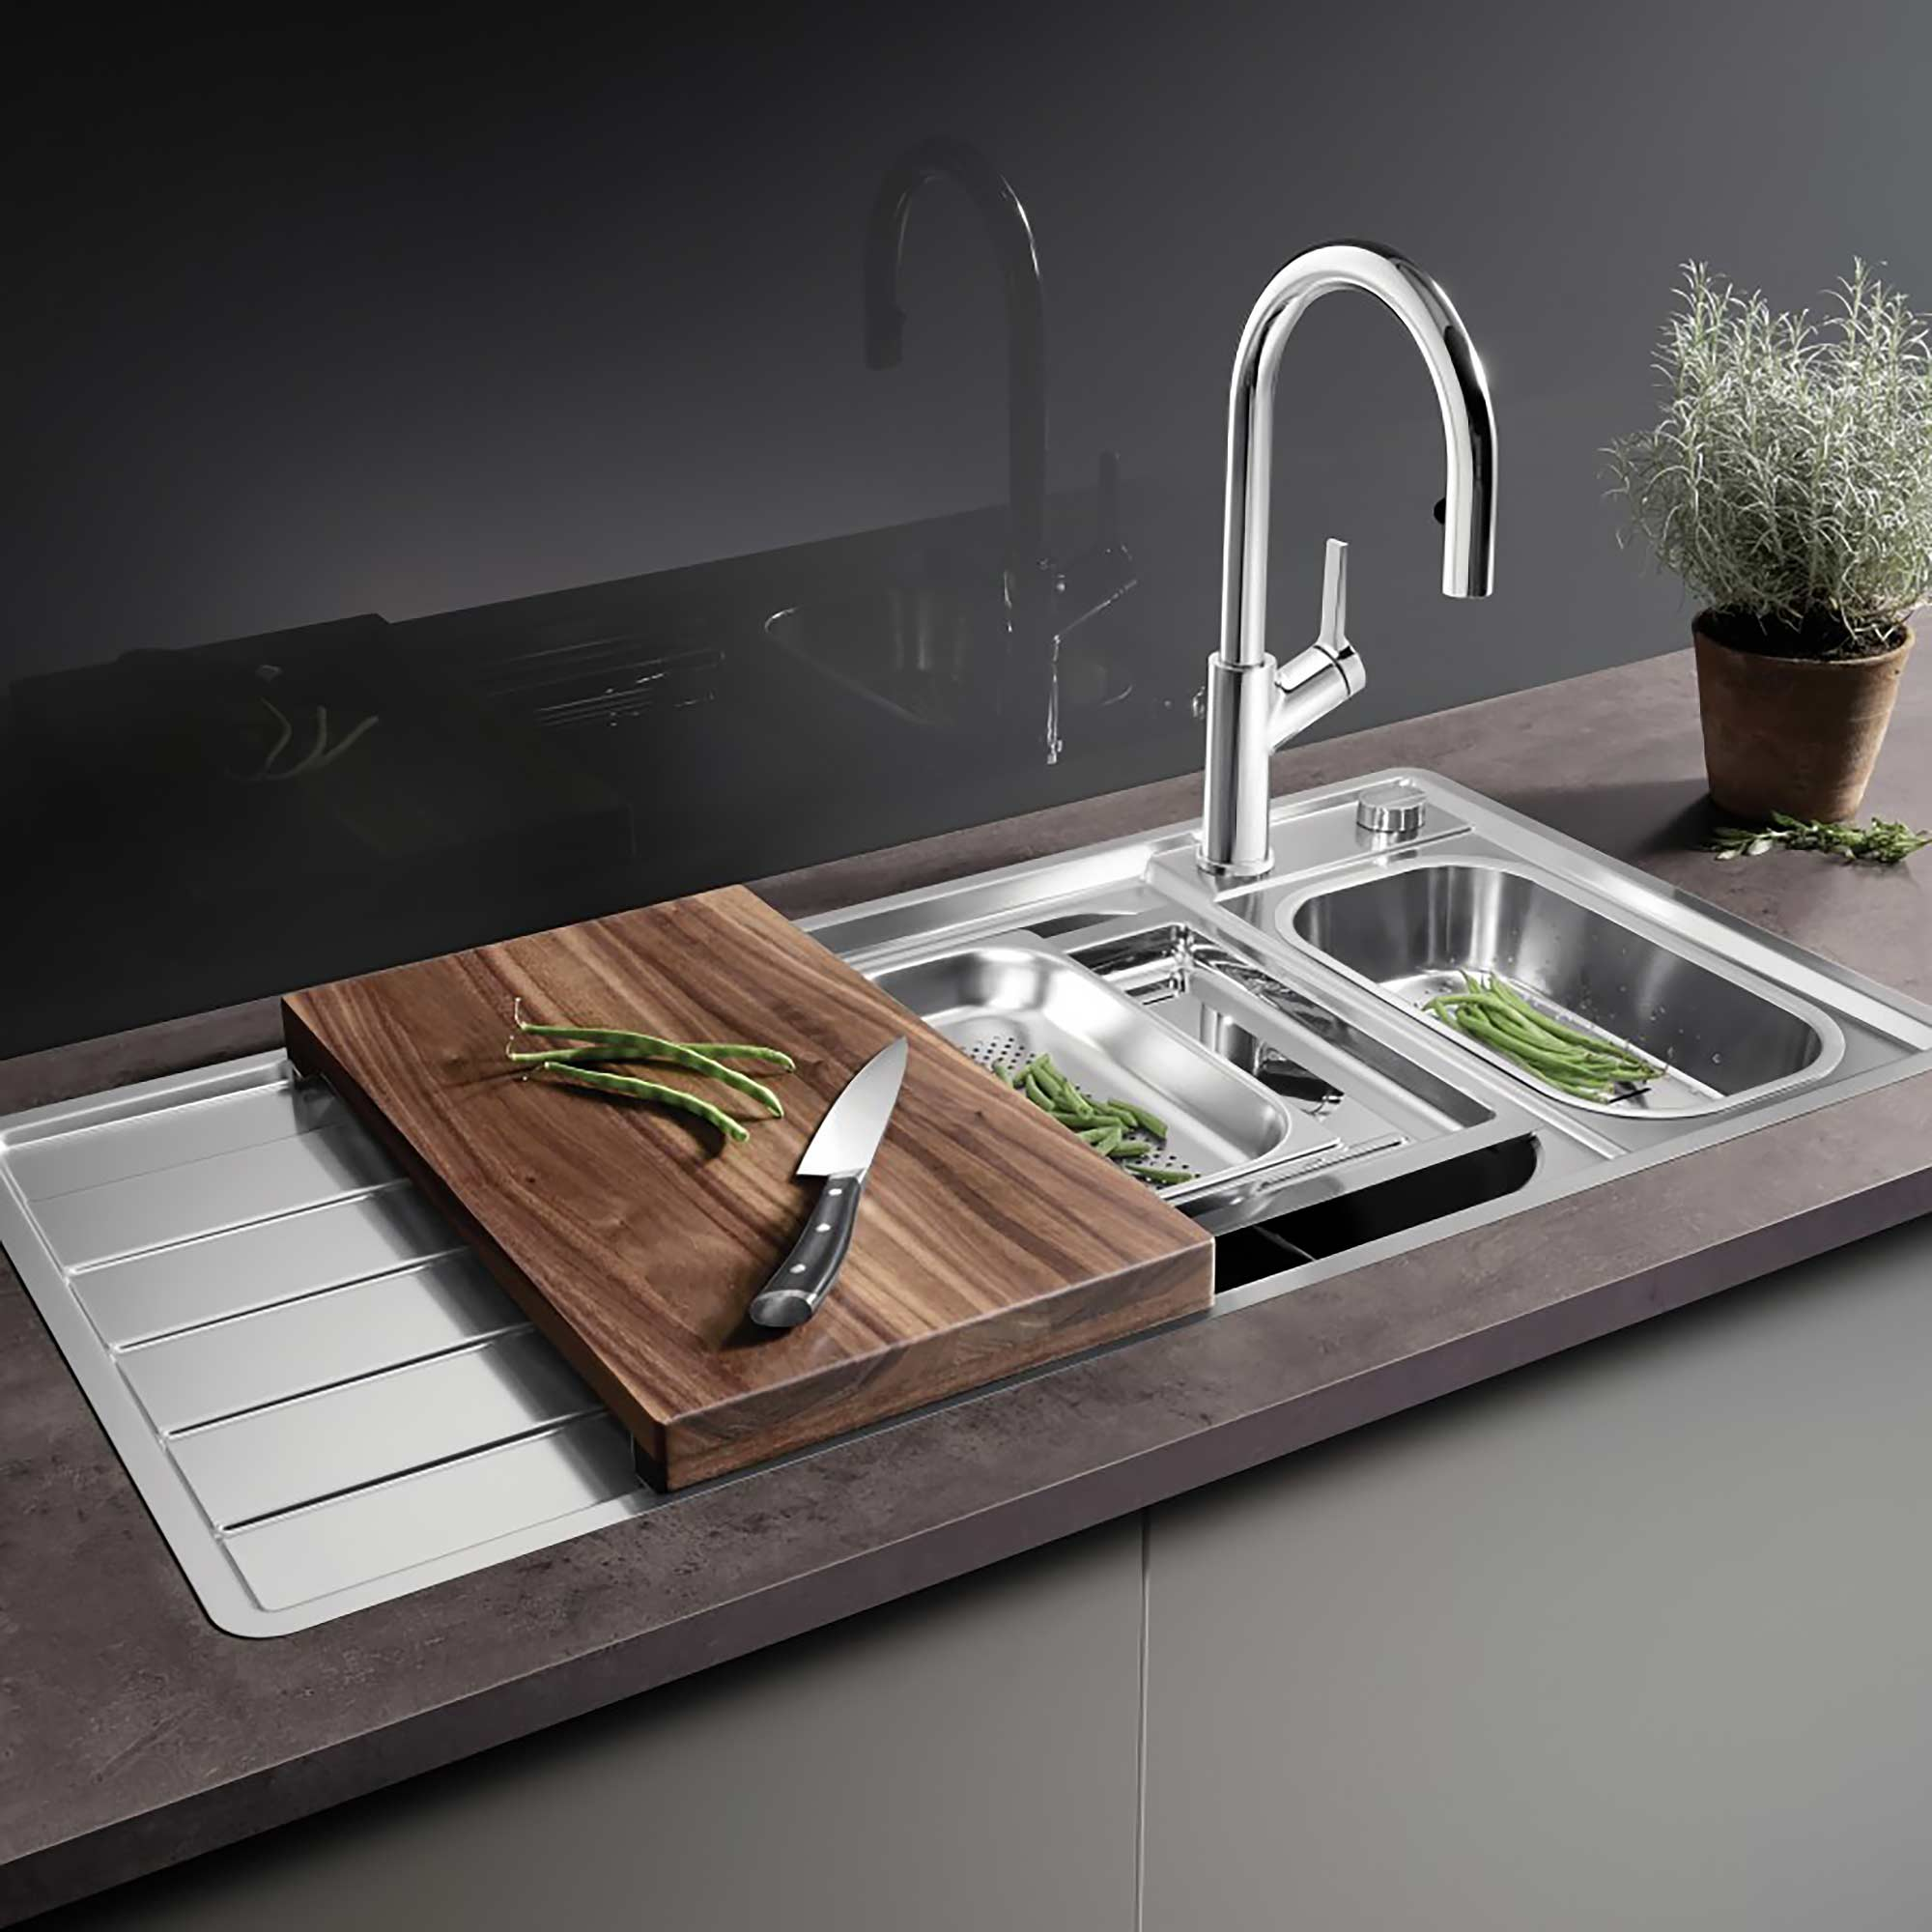 Blanco kitchen sink Axis